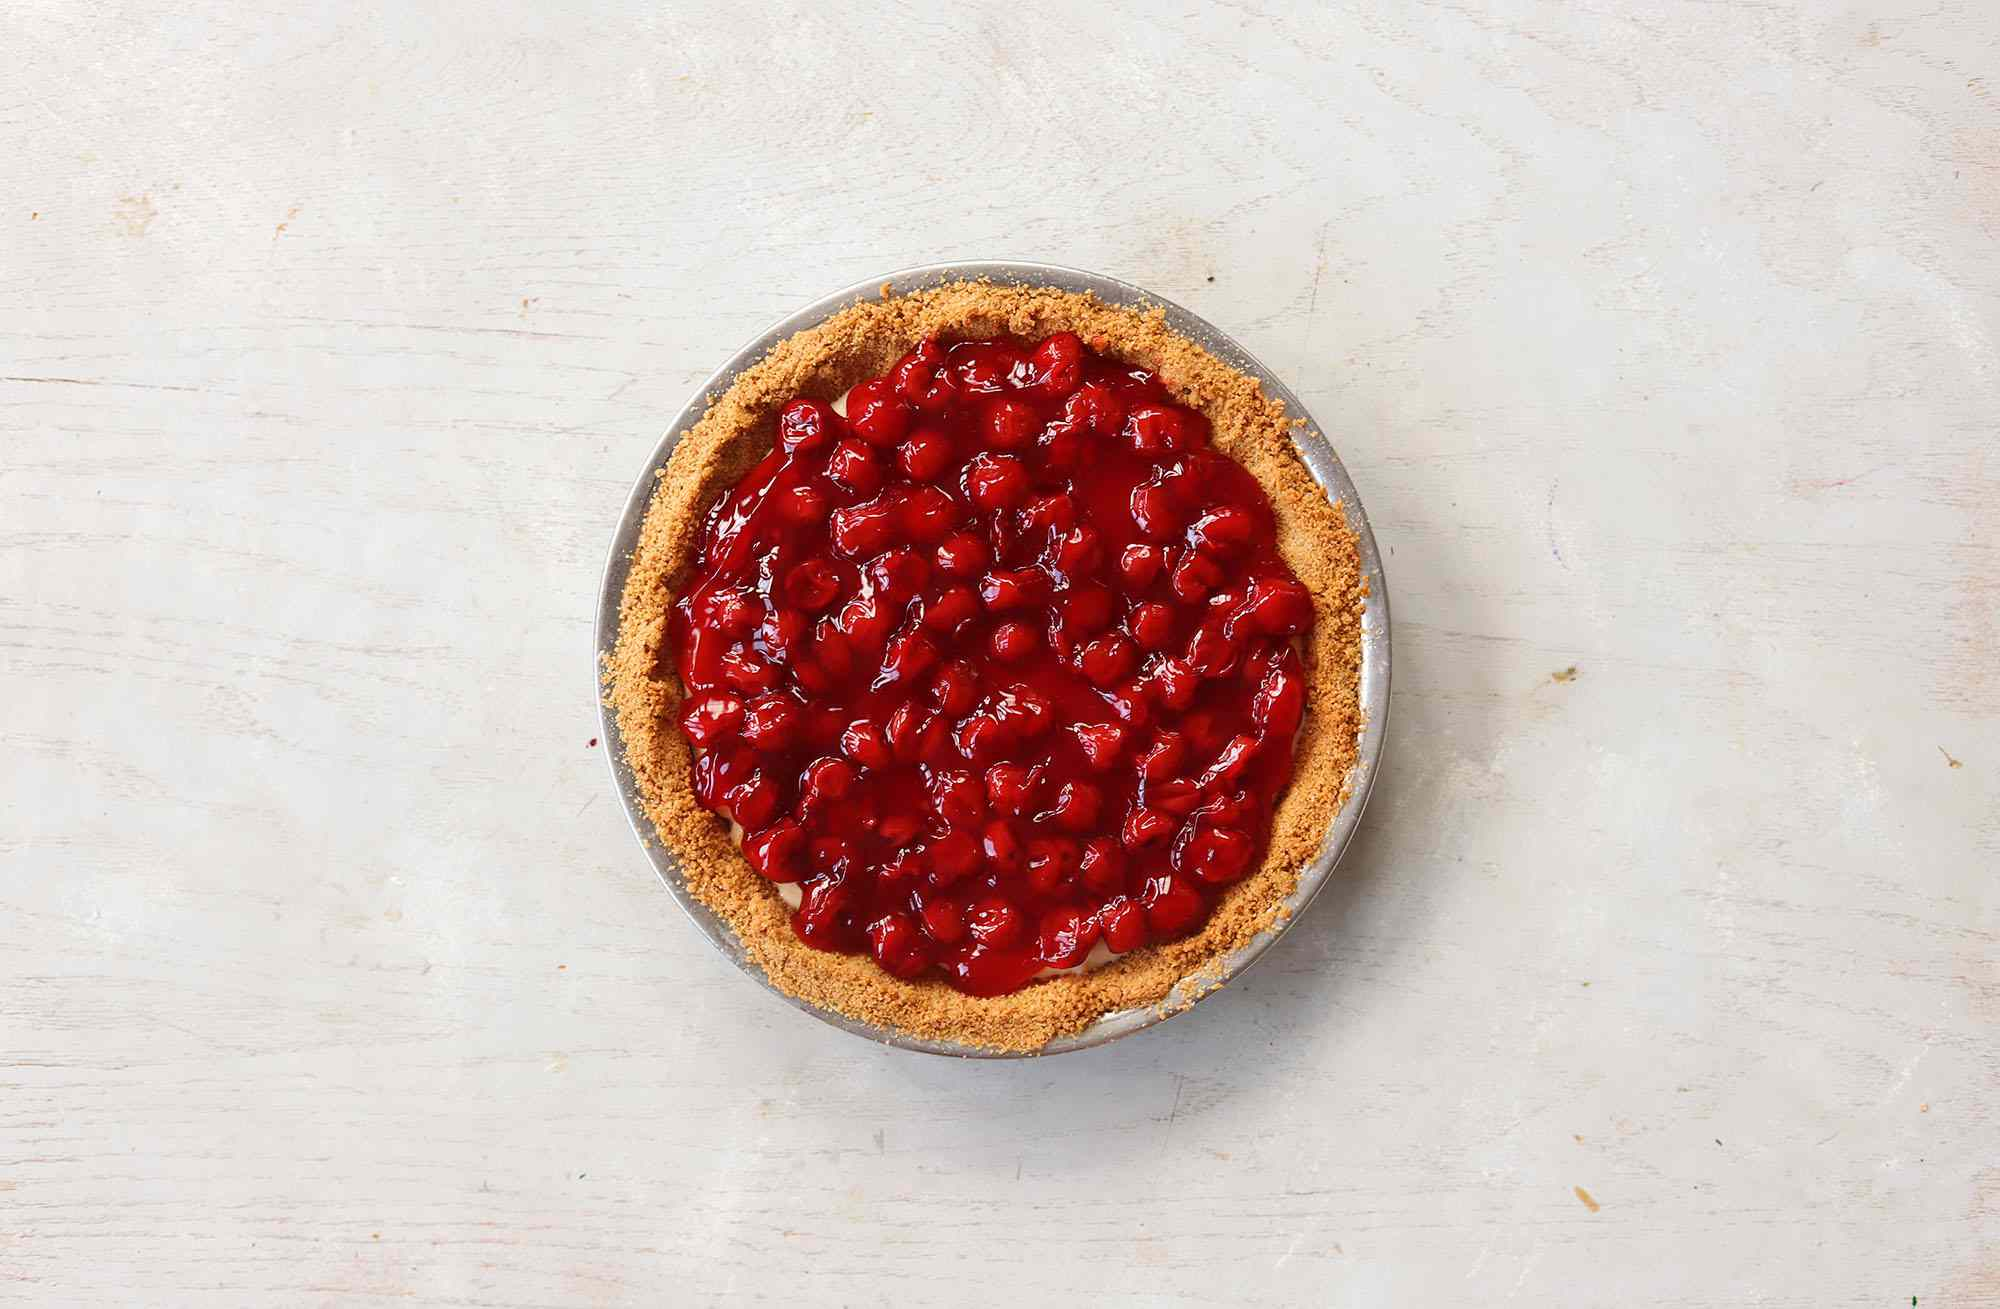 Cherry pie filling on top of cream cheese pie